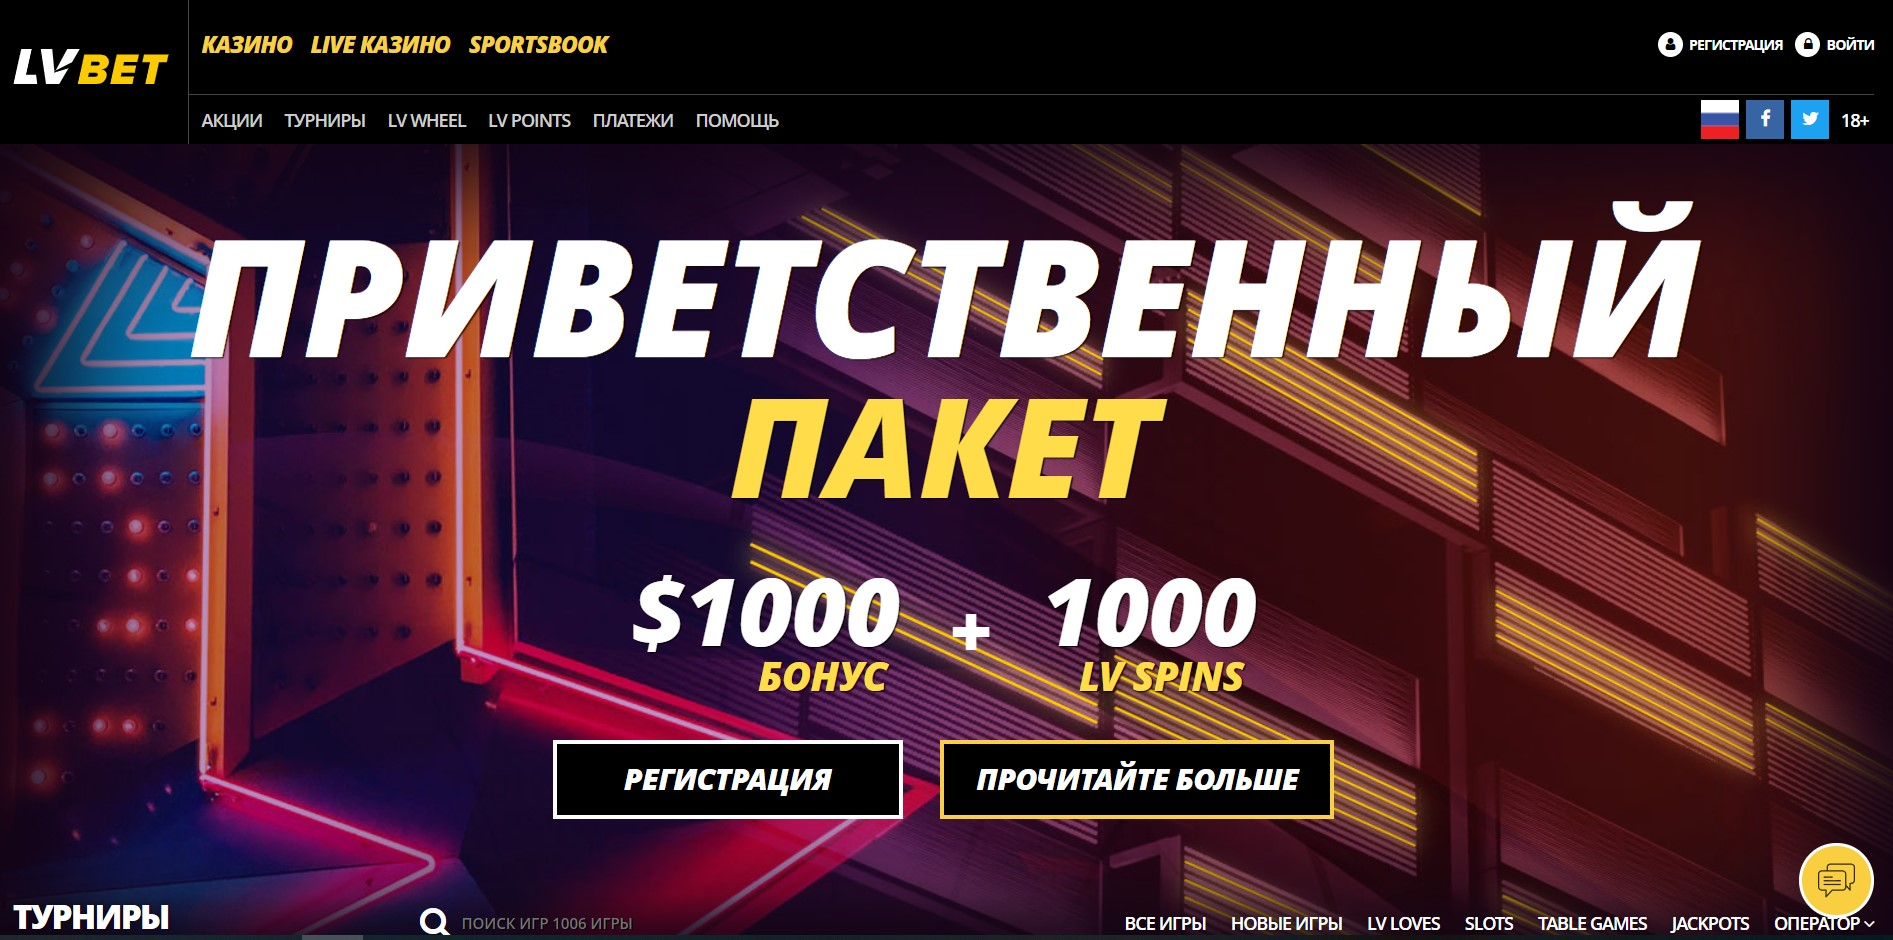 LV BET онлайн-казино